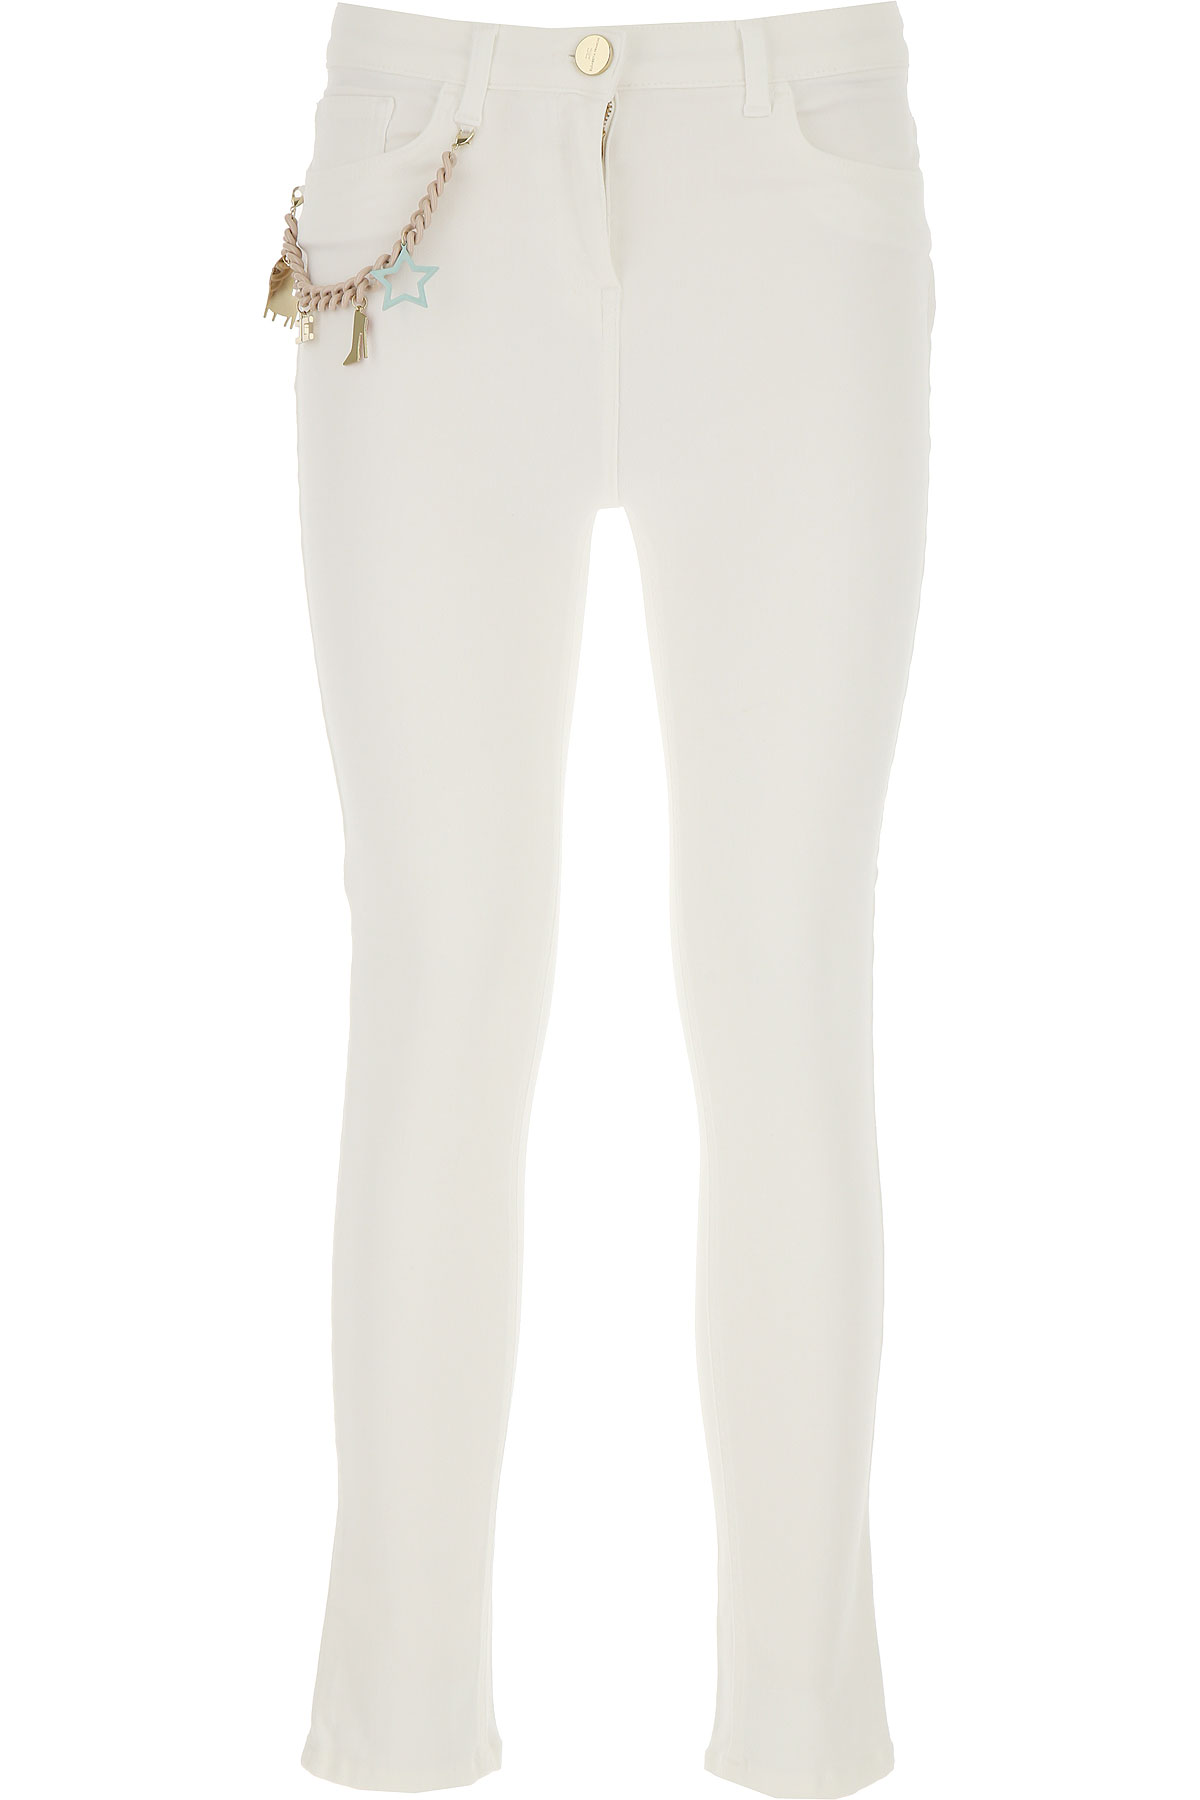 Elisabetta Franchi Jeans, White, Cotton, 2017, 27 28 29 30